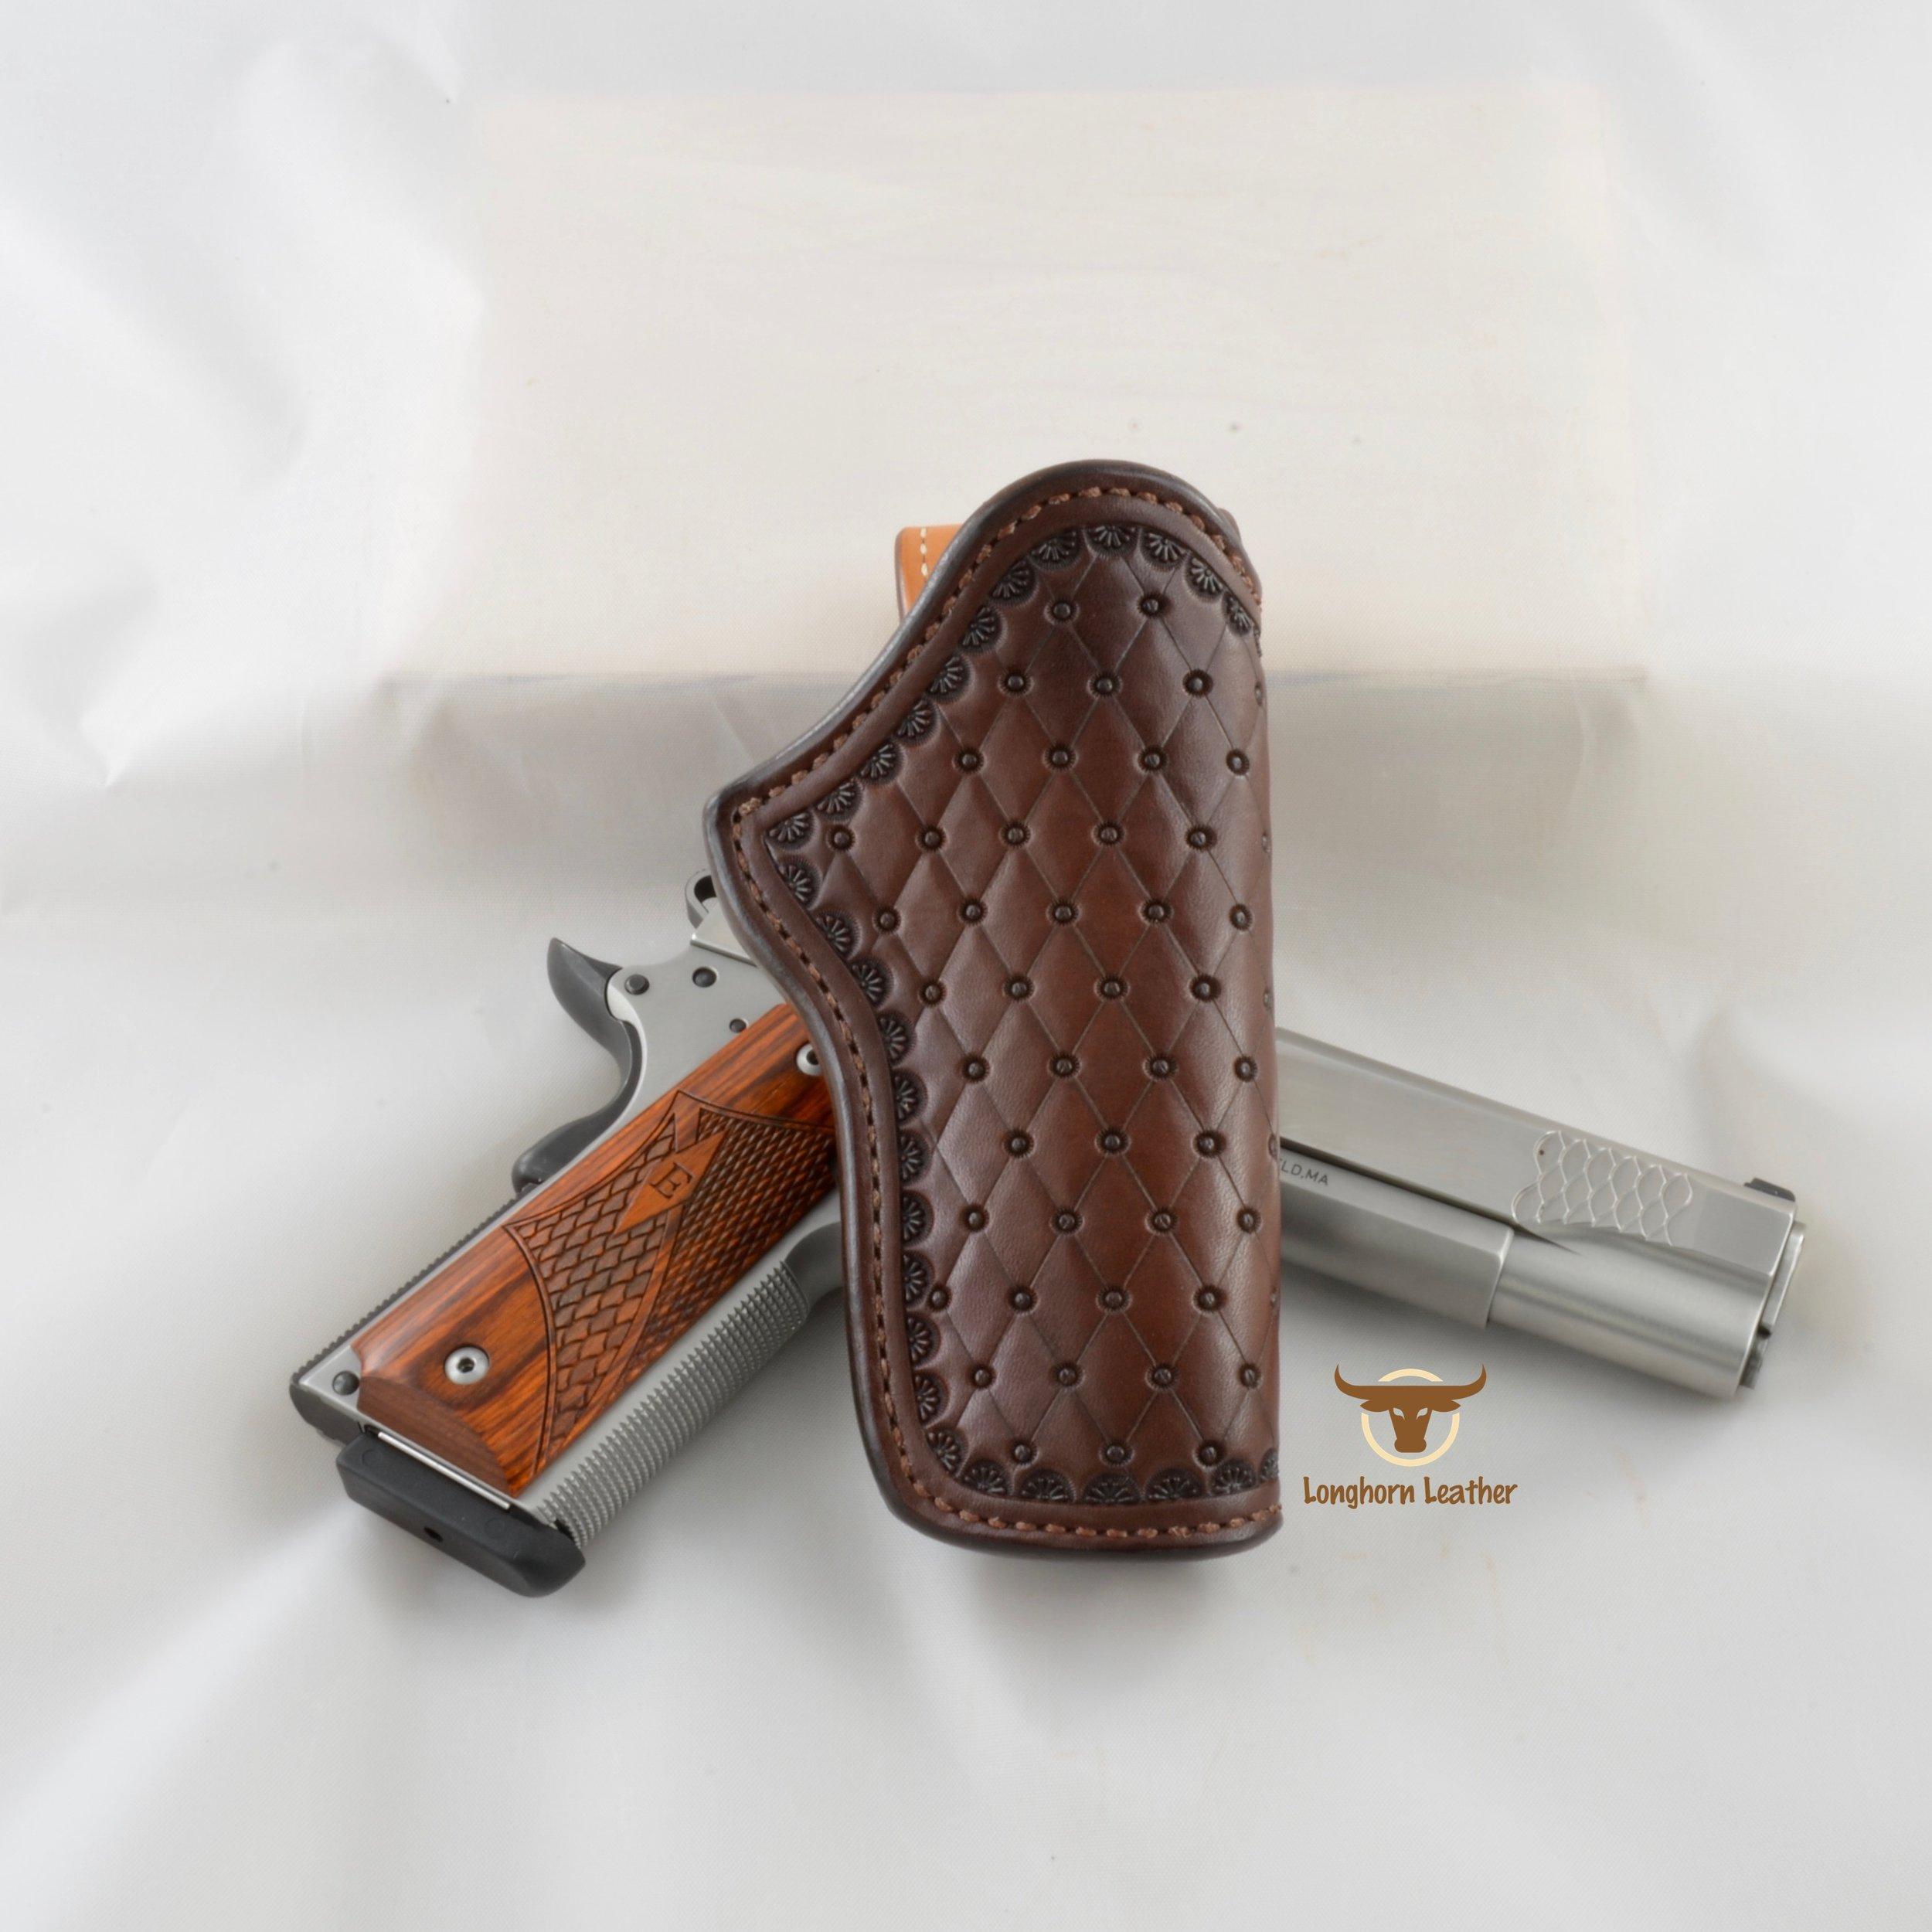 Longhorn Leather AZ - 1911 Holster featurng the %22San Carlos%22 design 2.jpg